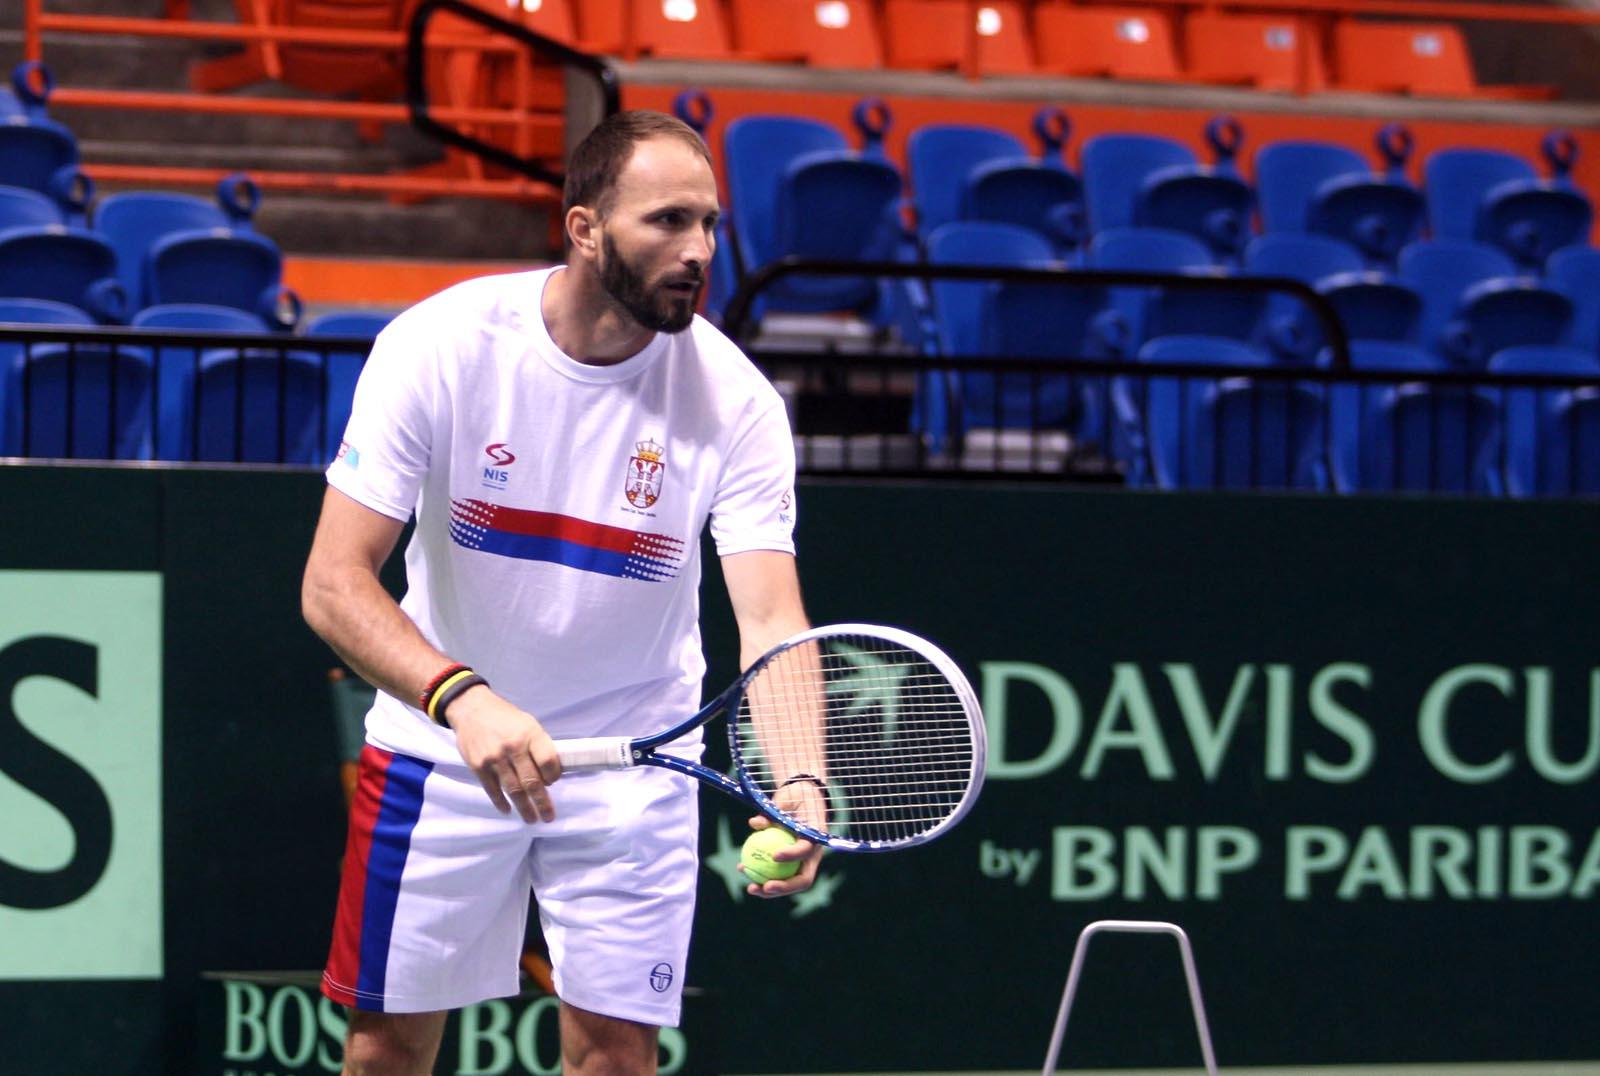 Tenis: Dušan Vemić novi selektor najbolje ženske selekcije Srbije